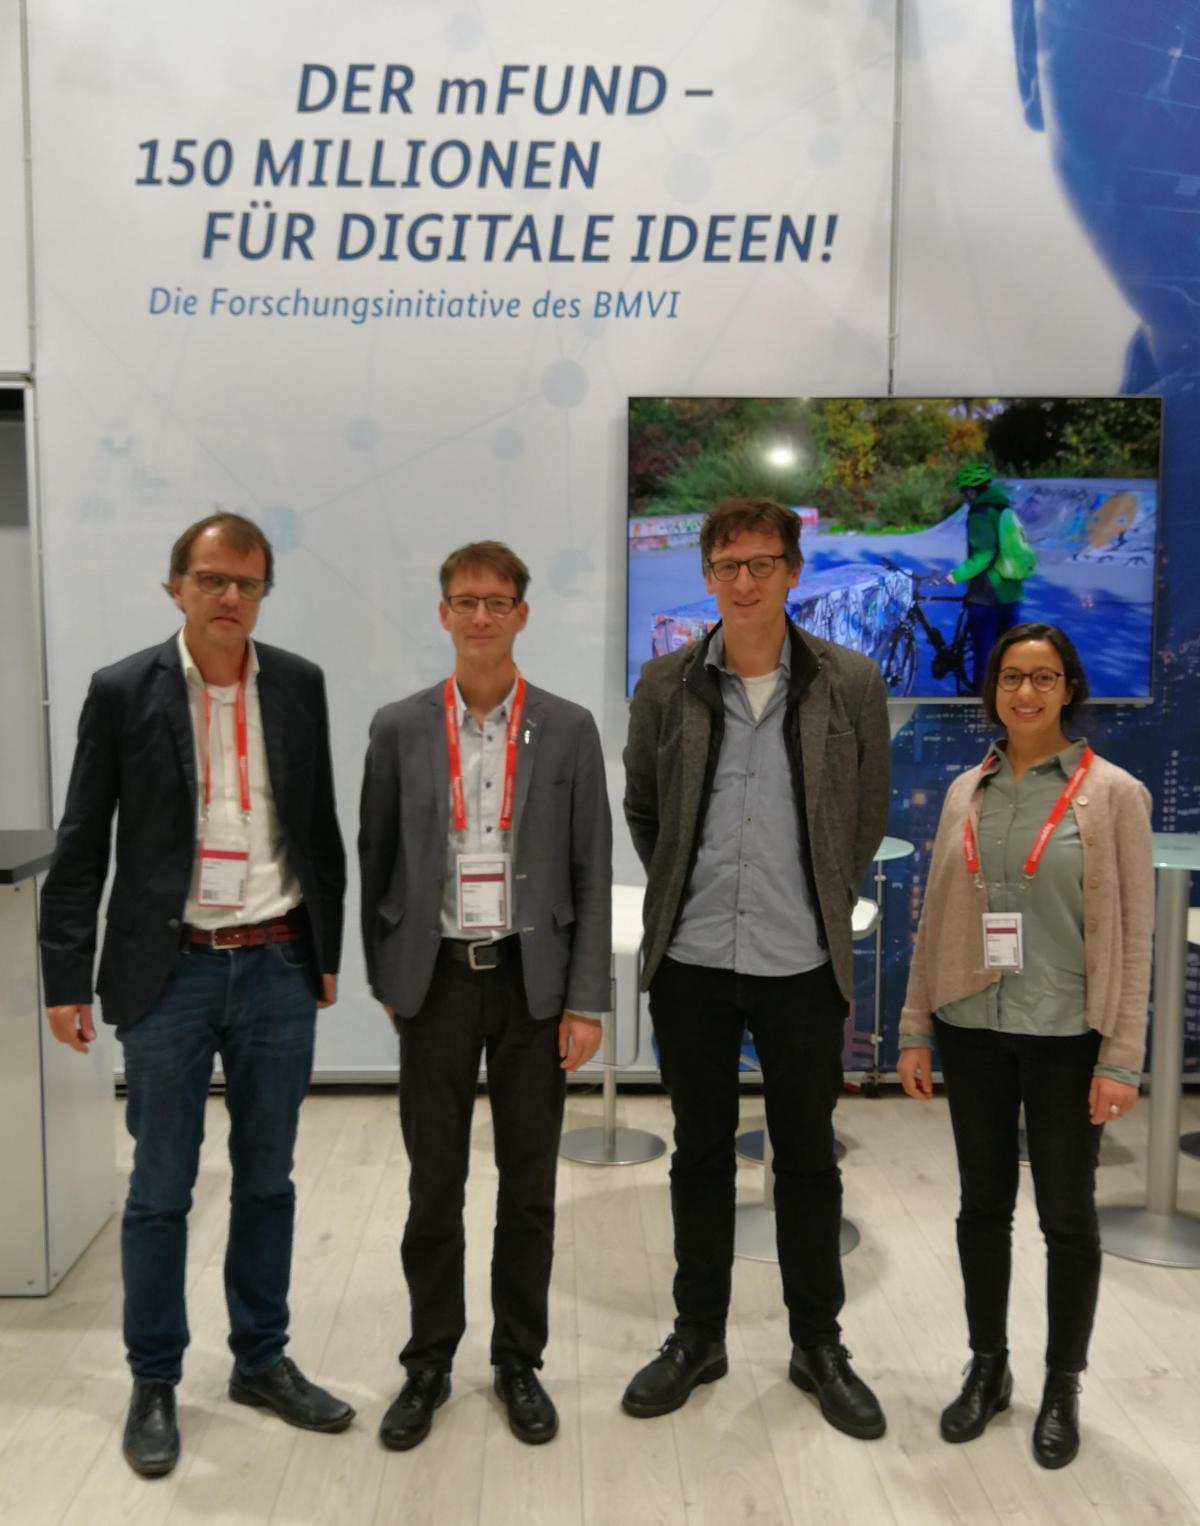 incora-Kickoff: Dr. Fabian Dosch (BBSR); Dr. Markus Neteler, (mundialis GmbH & Co KG), Prof. Dr. Stefan Fina (ILS); Dr. Hajar Benelcadi, mundialis GmbH & Co KG (v. l. n. r.)